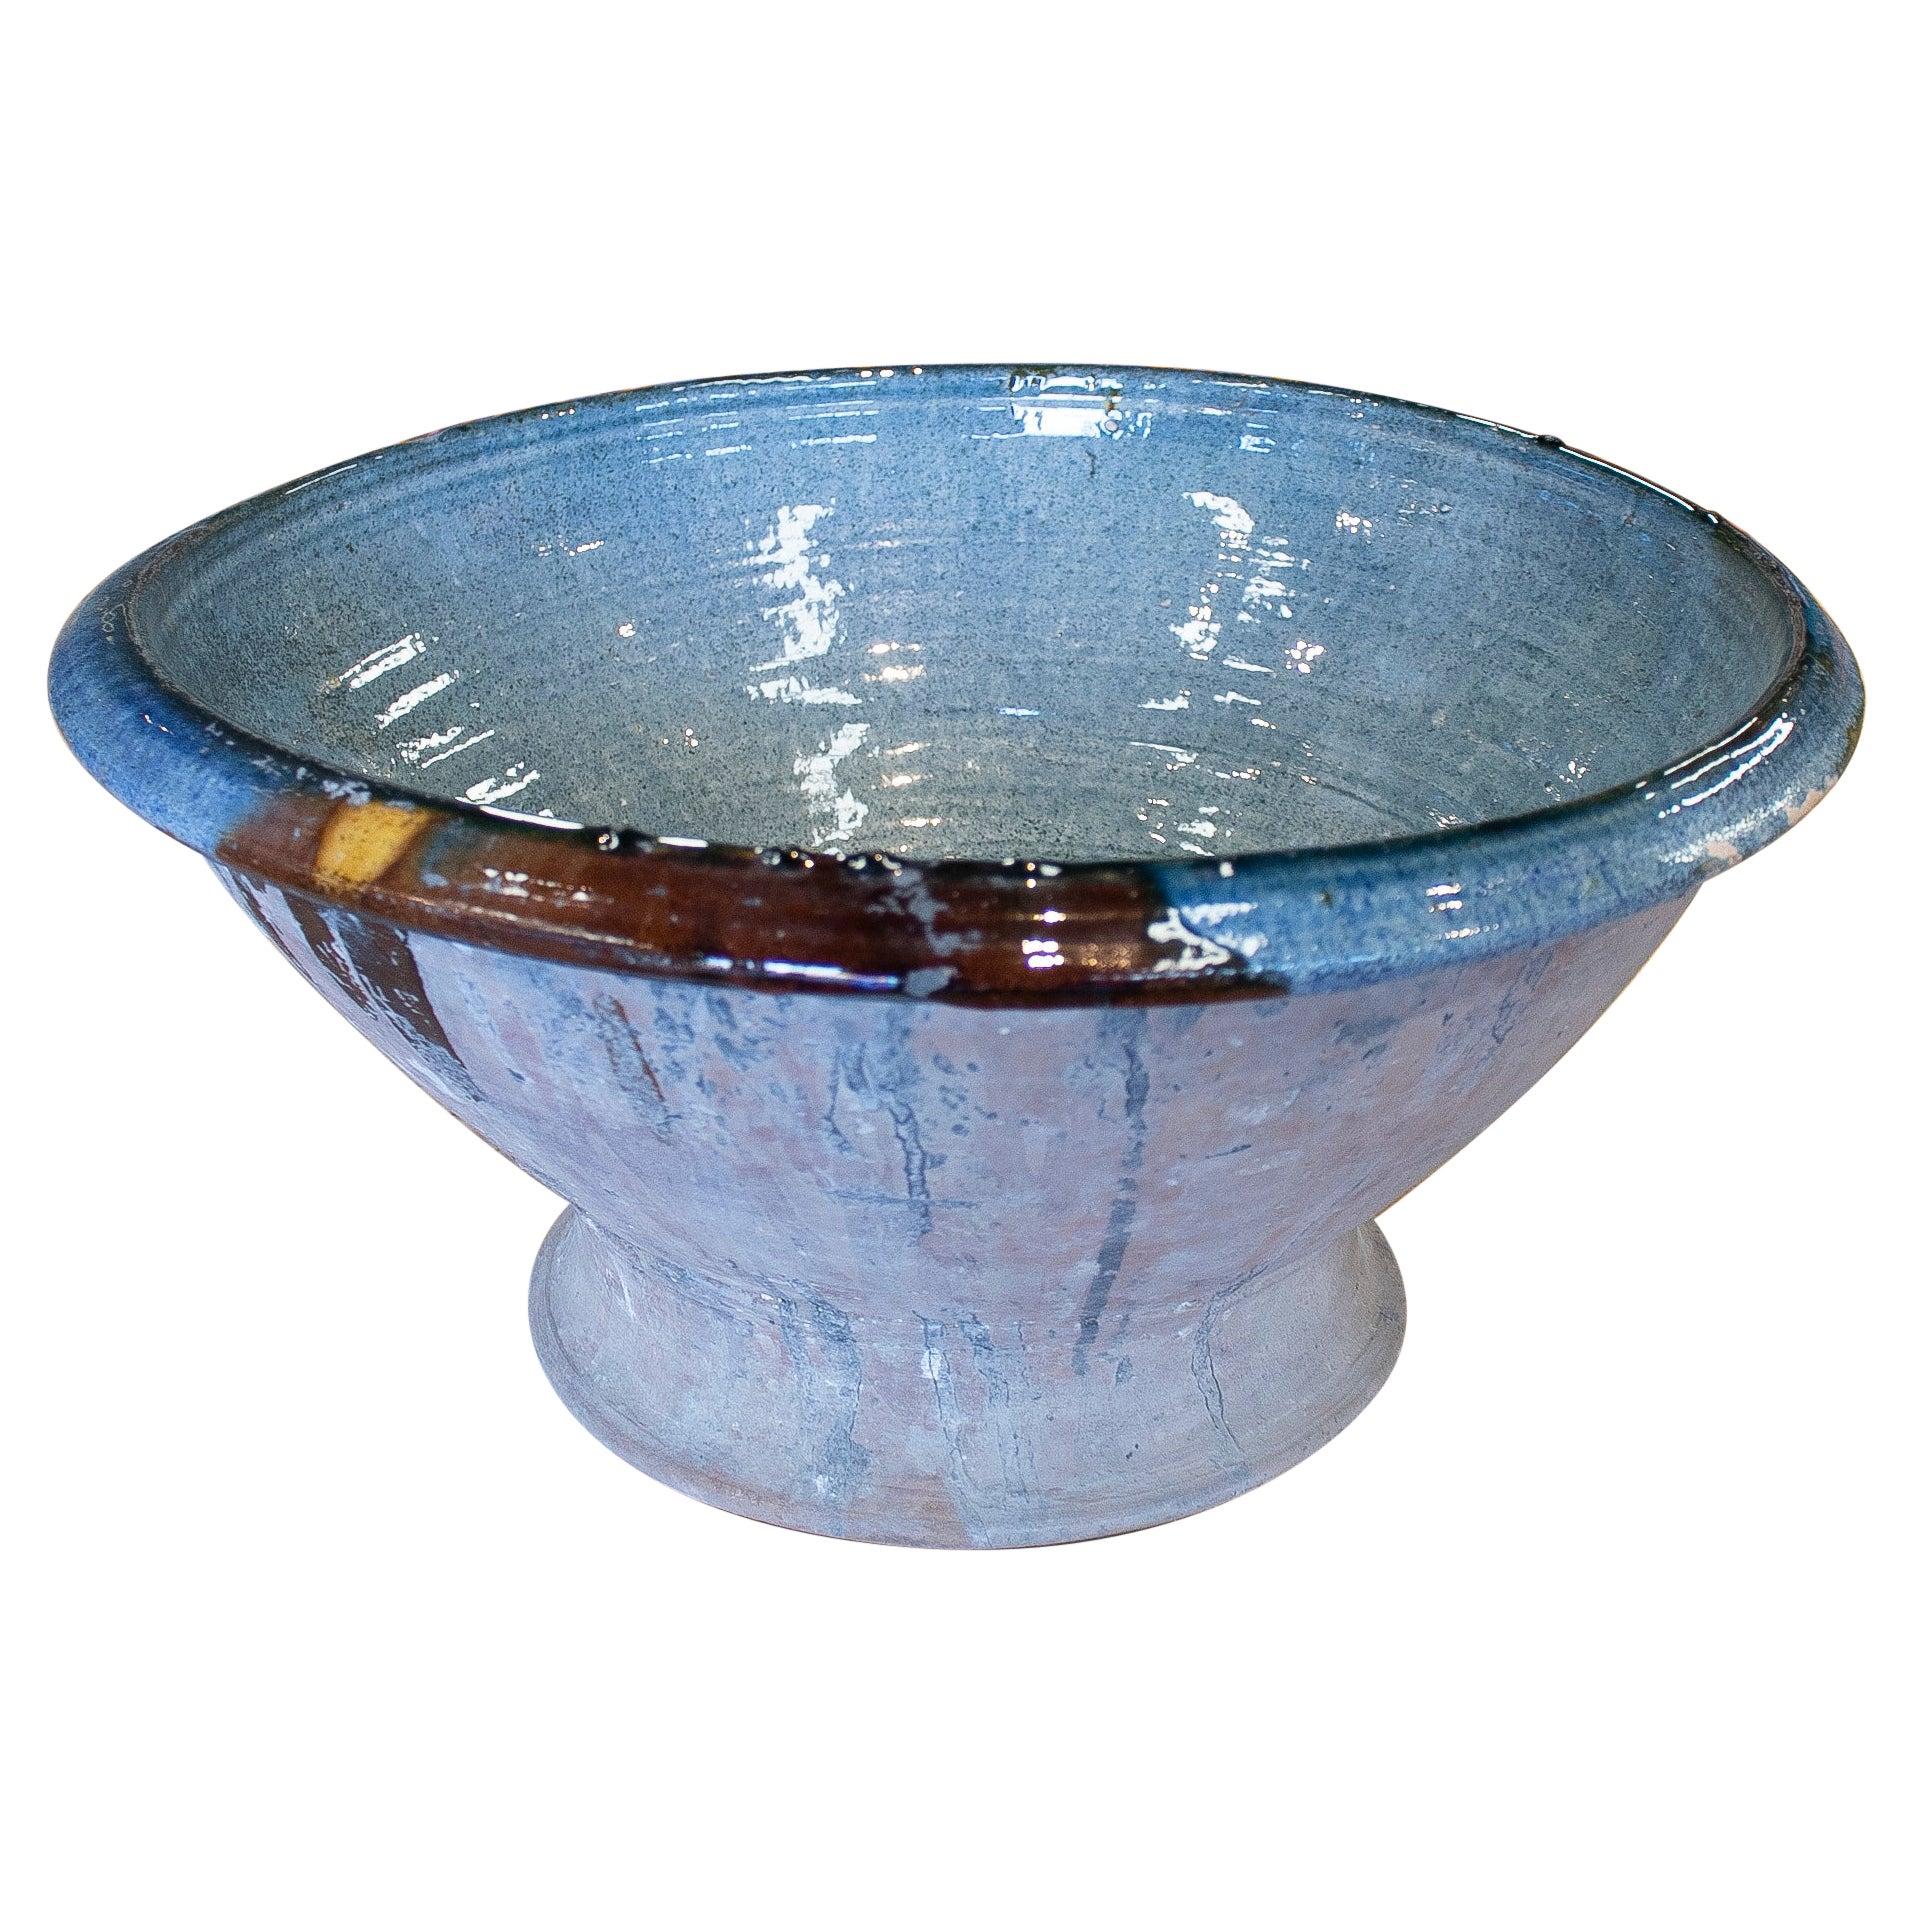 1960s Spanish Blue Glazed Ceramic Bowl